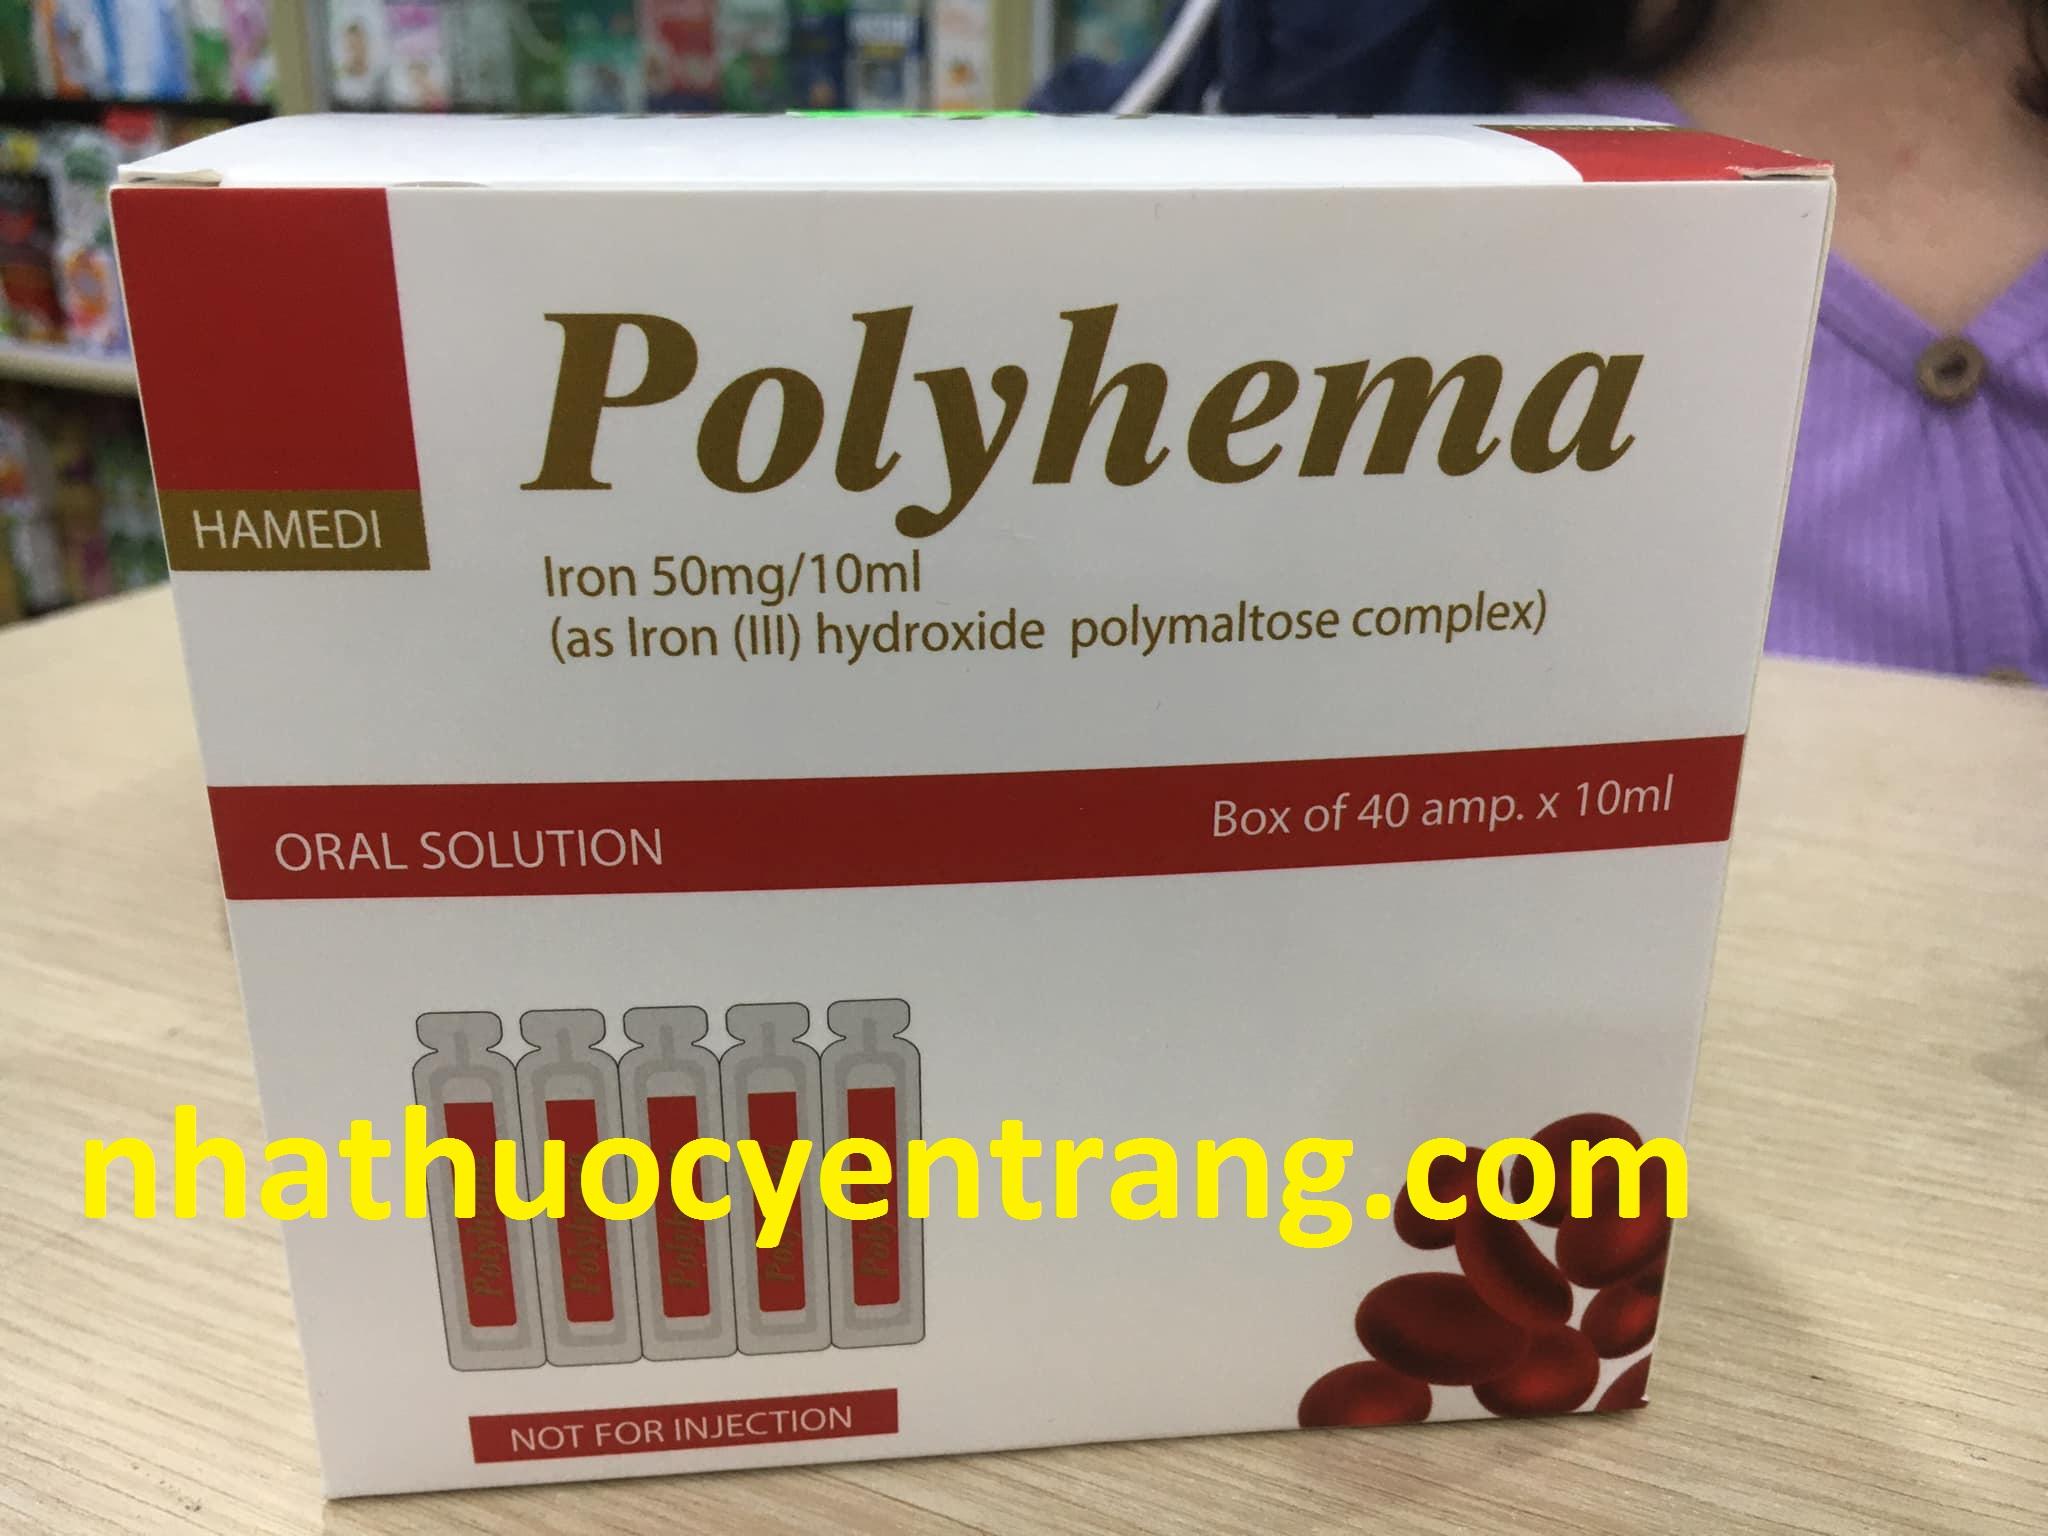 Polyhema